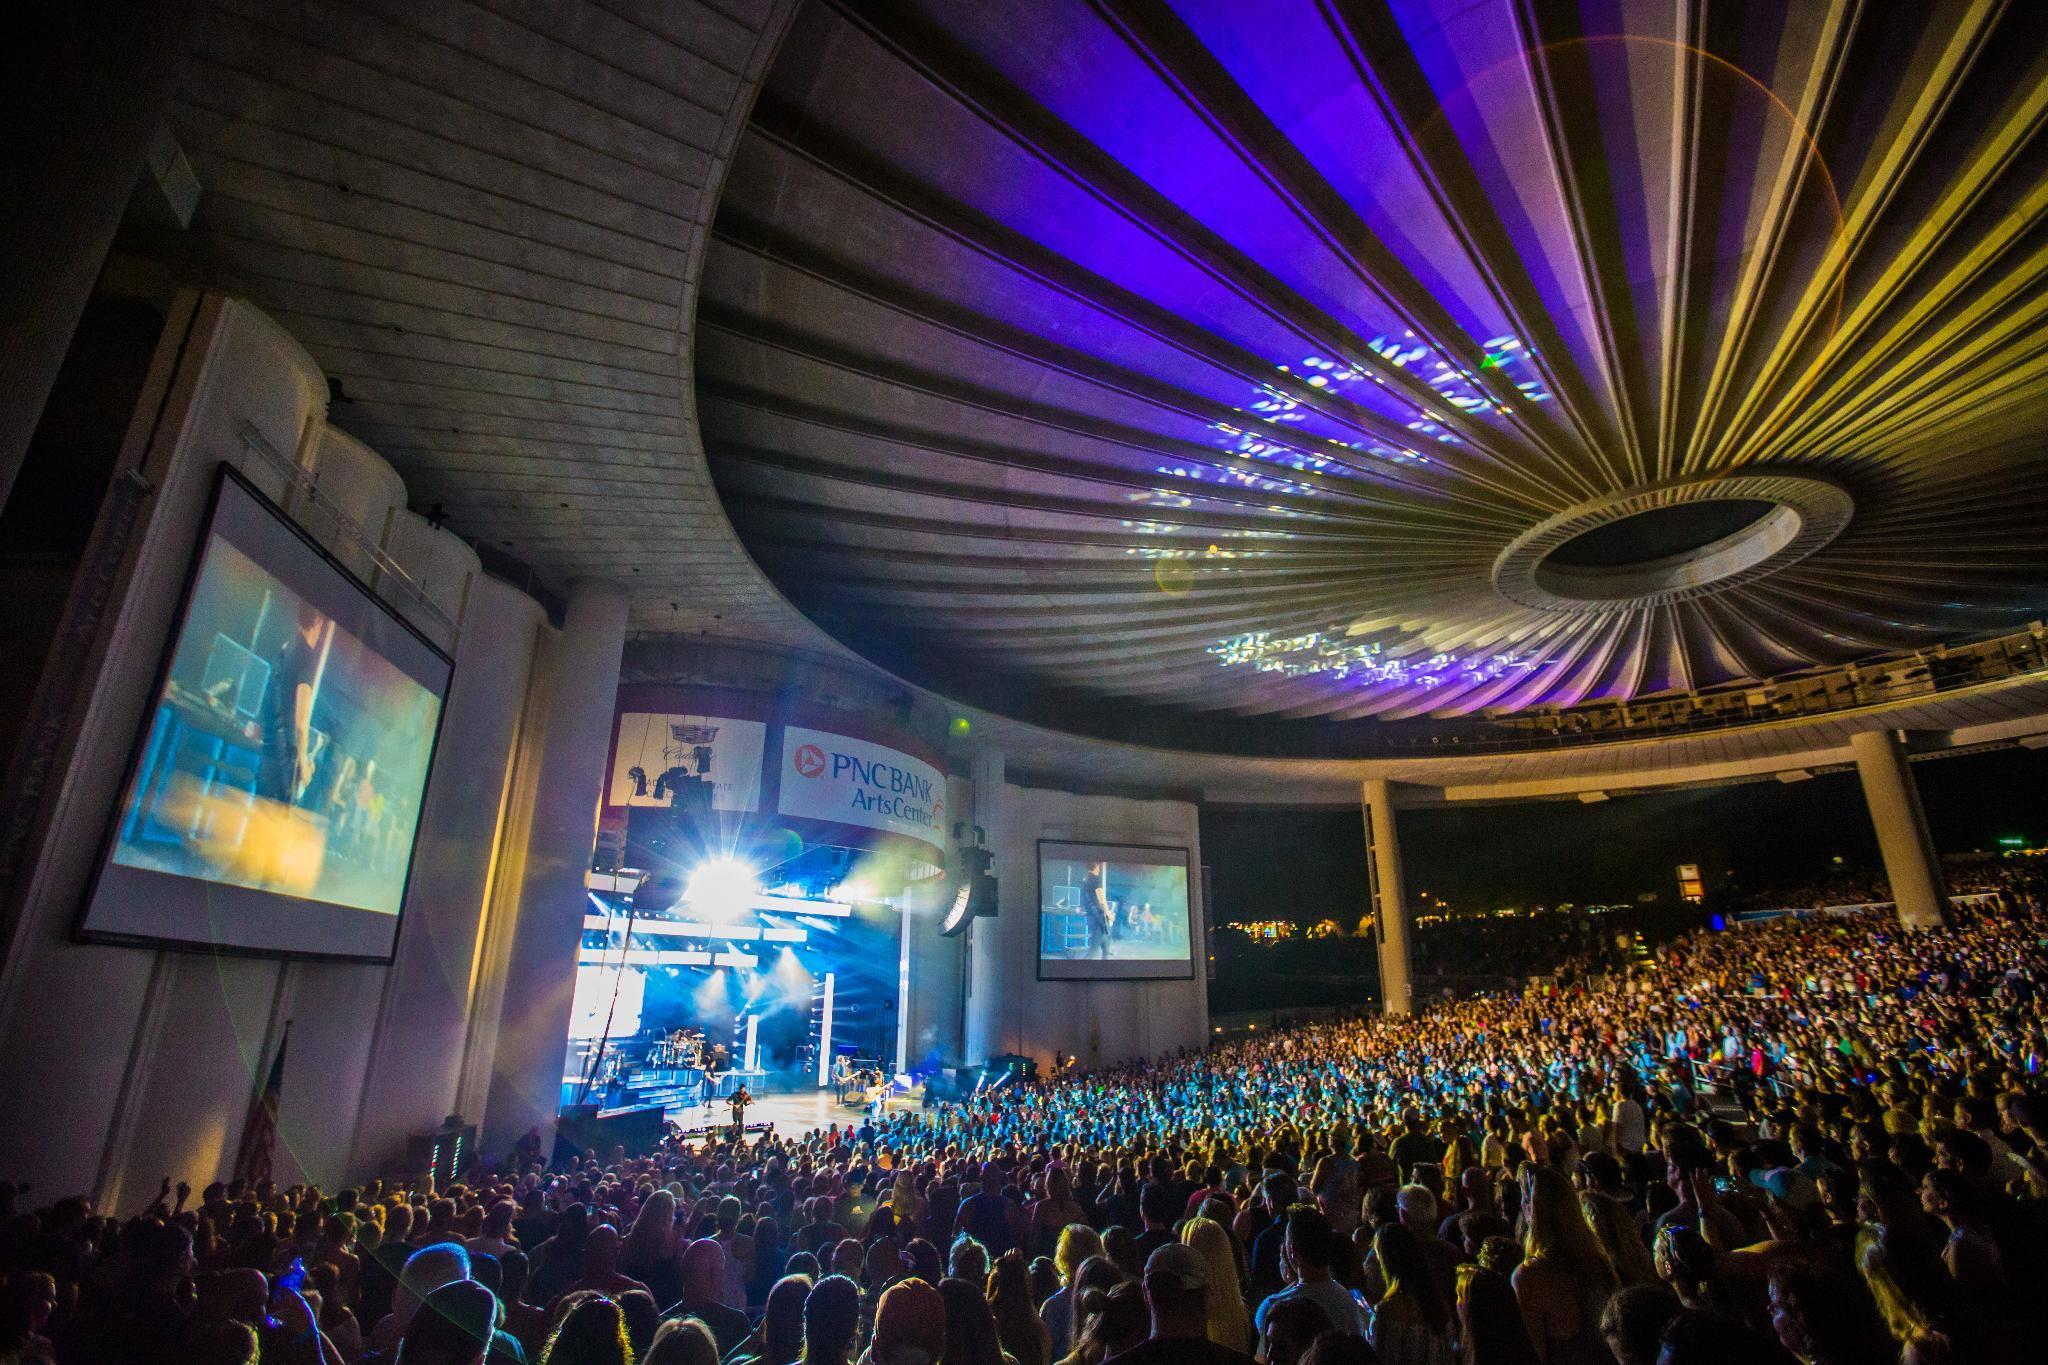 Pnc Bank Arts Center Christmas Lights 2020 Step Inside: PNC Bank Arts Center — Holmdel, NJ | Ticketmaster Blog